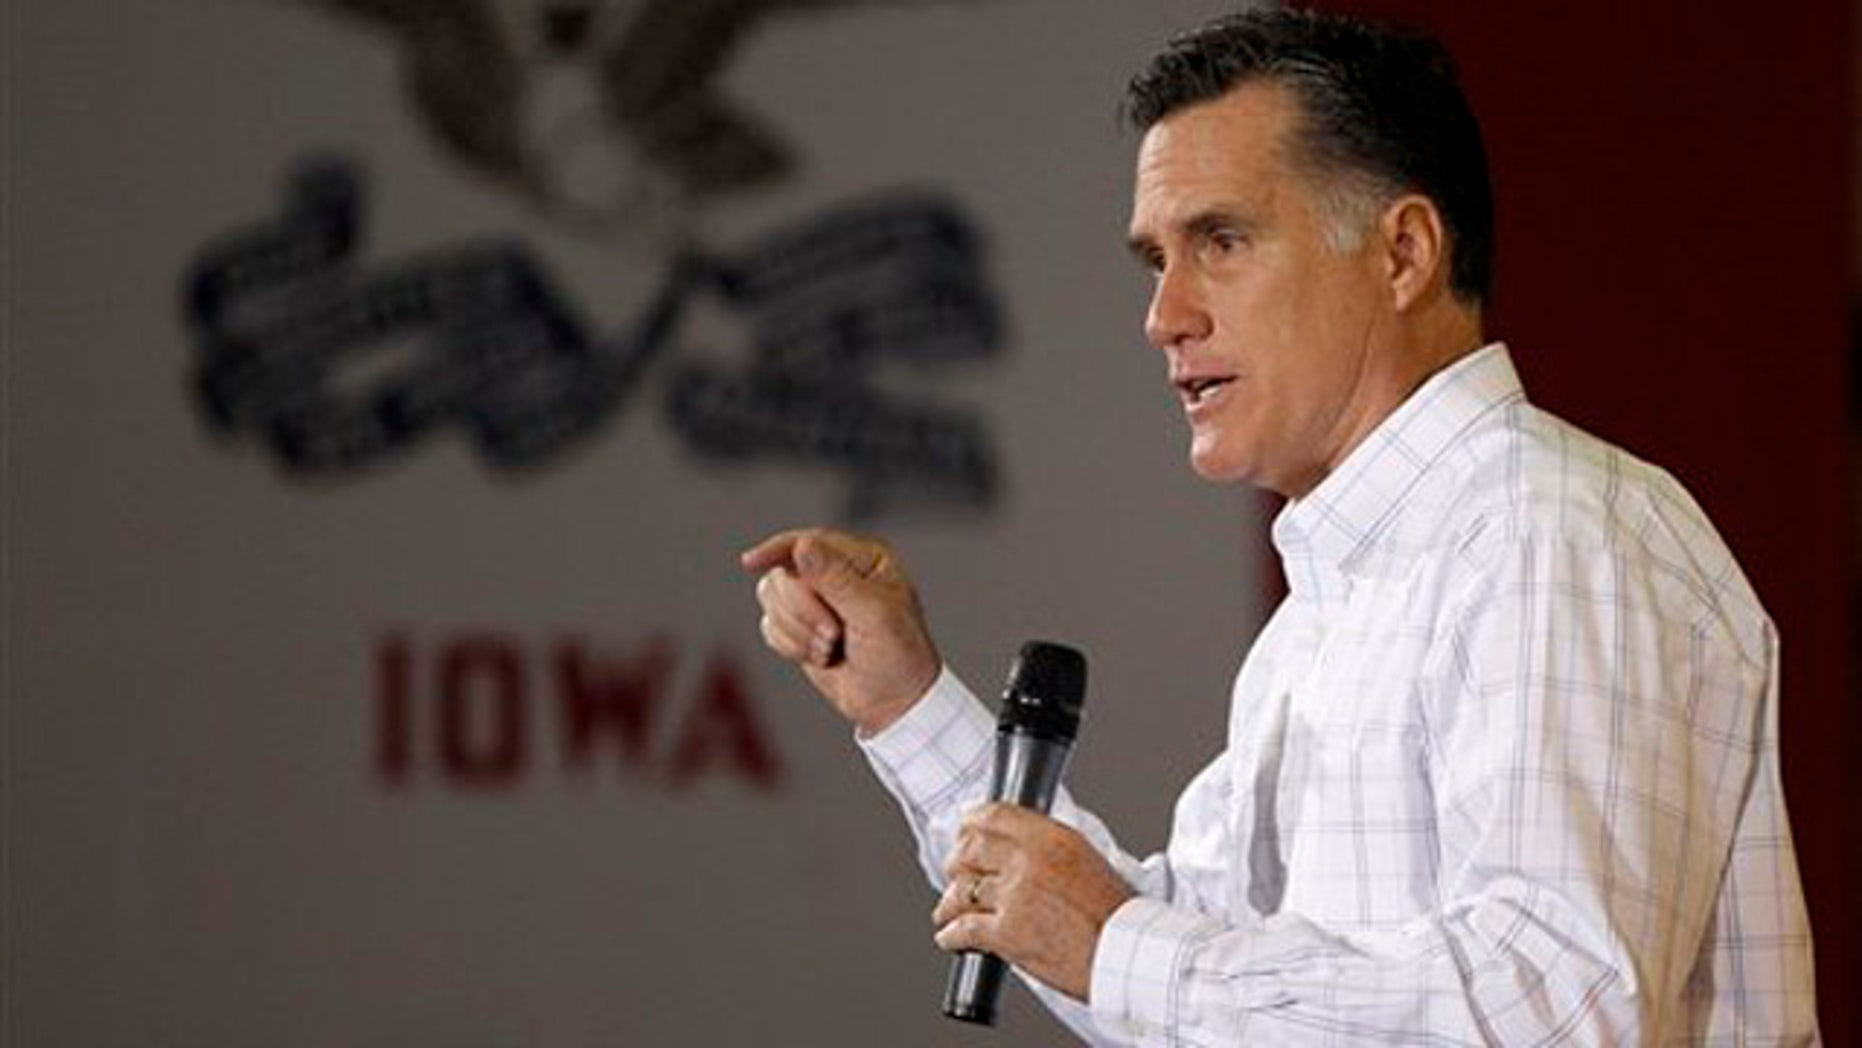 Dec. 16, 2011: Mitt Romney speaks during a rally at Missouri Valley Steel in Sioux City, Iowa.